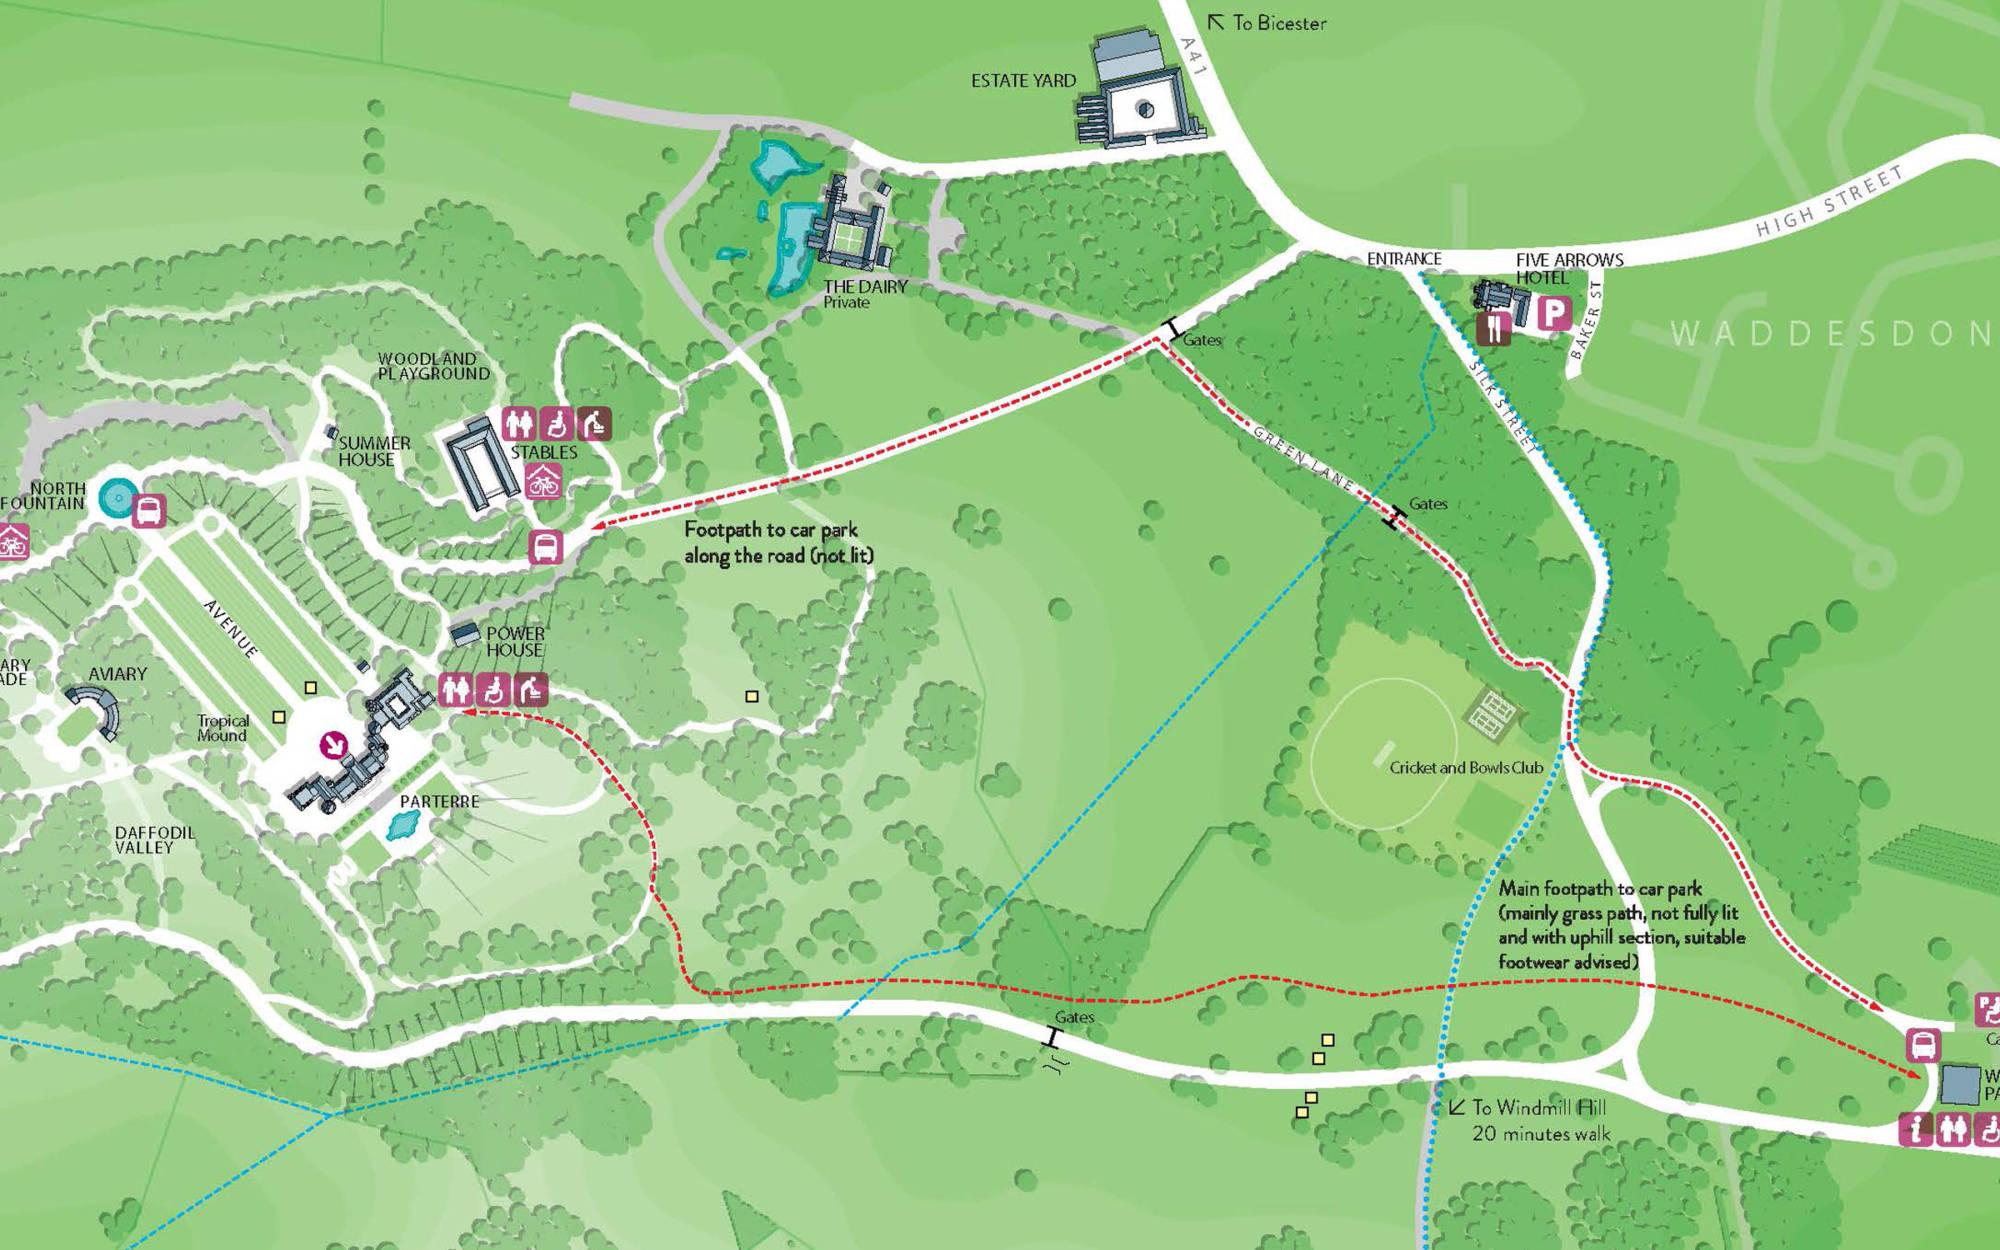 Grounds map showing bike sheds